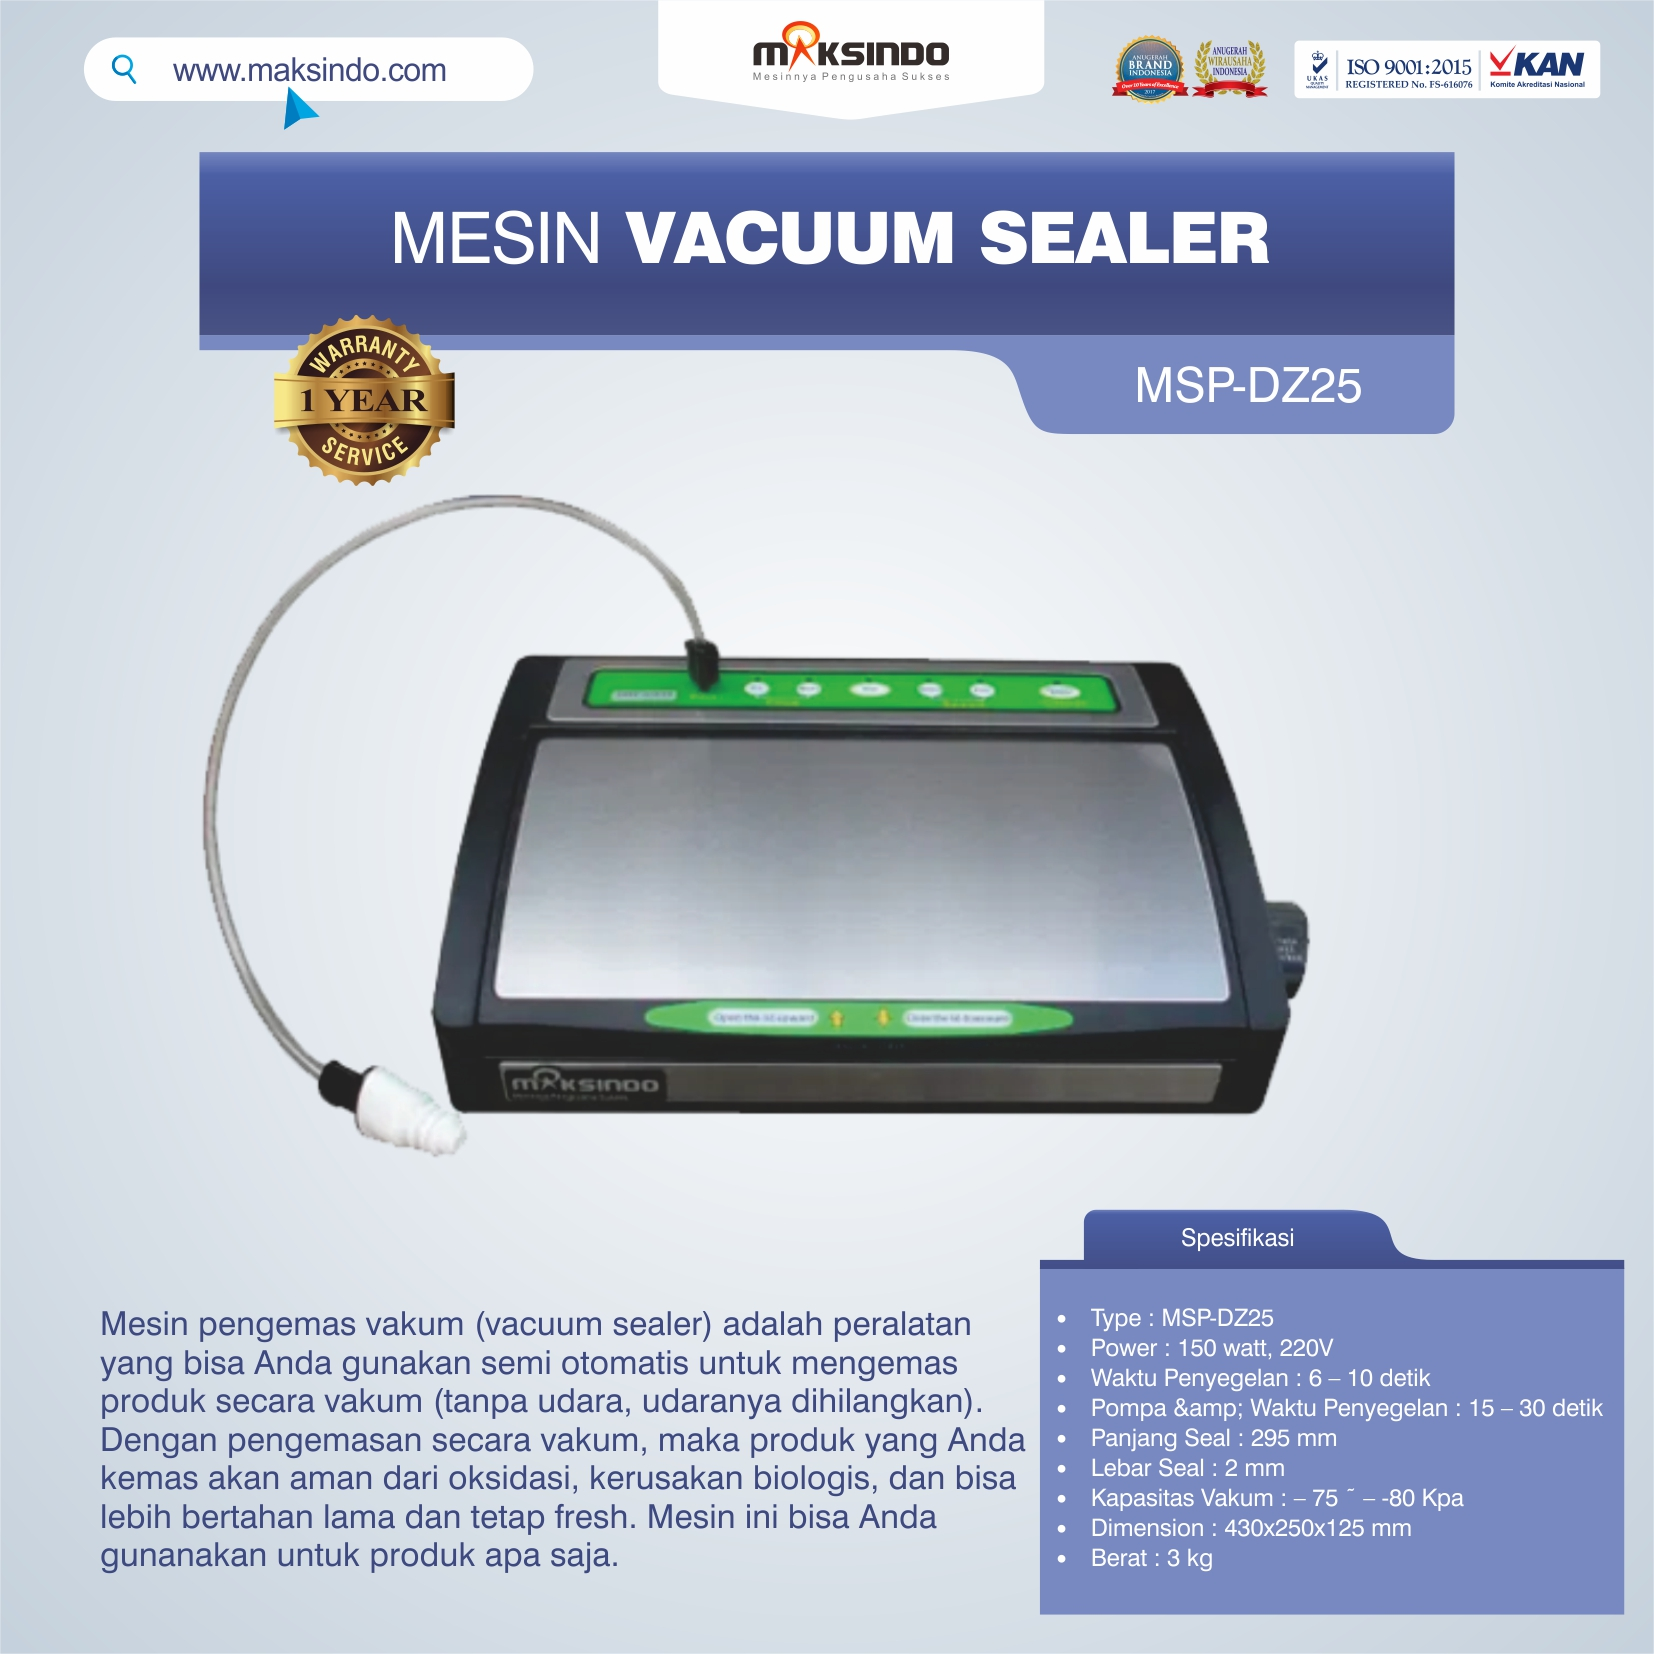 Jual Vacuum Sealer MSP-DZ25 di Malang